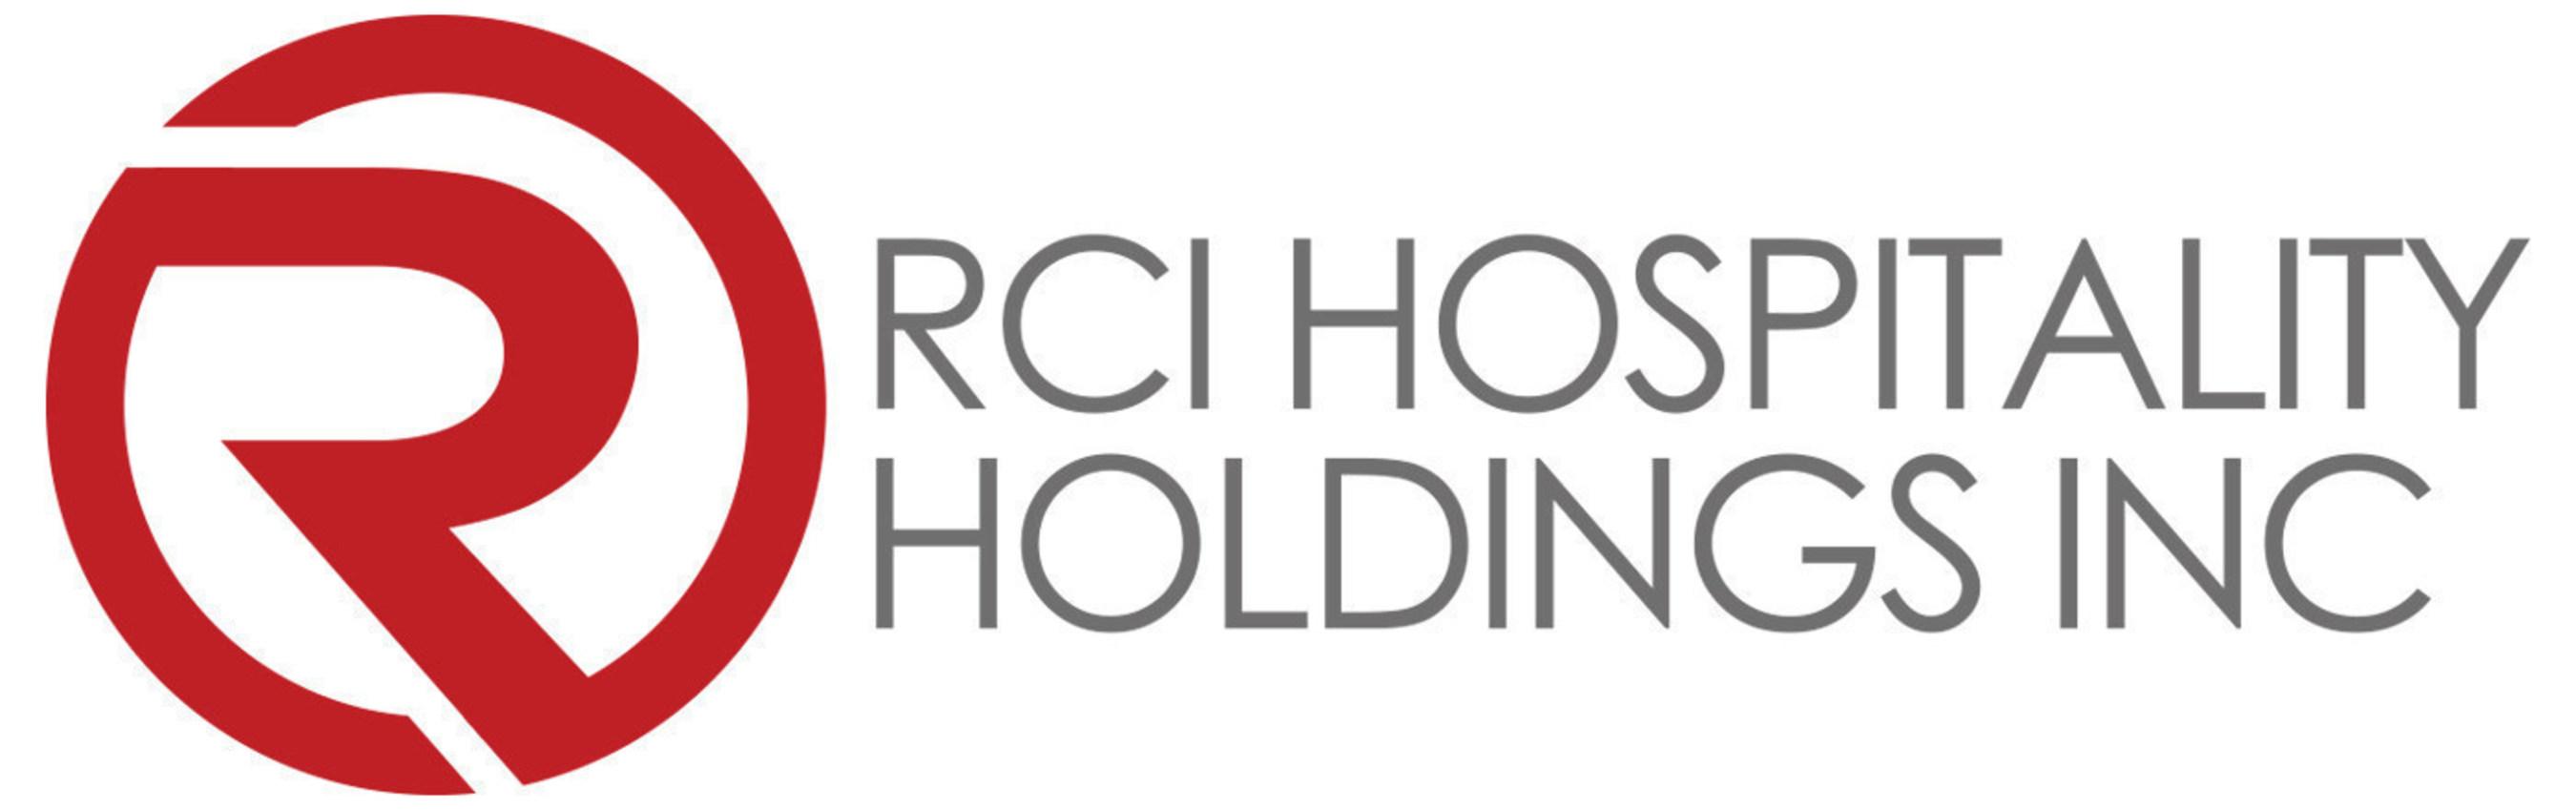 RCI Hospitality Holdings Corporate Logo